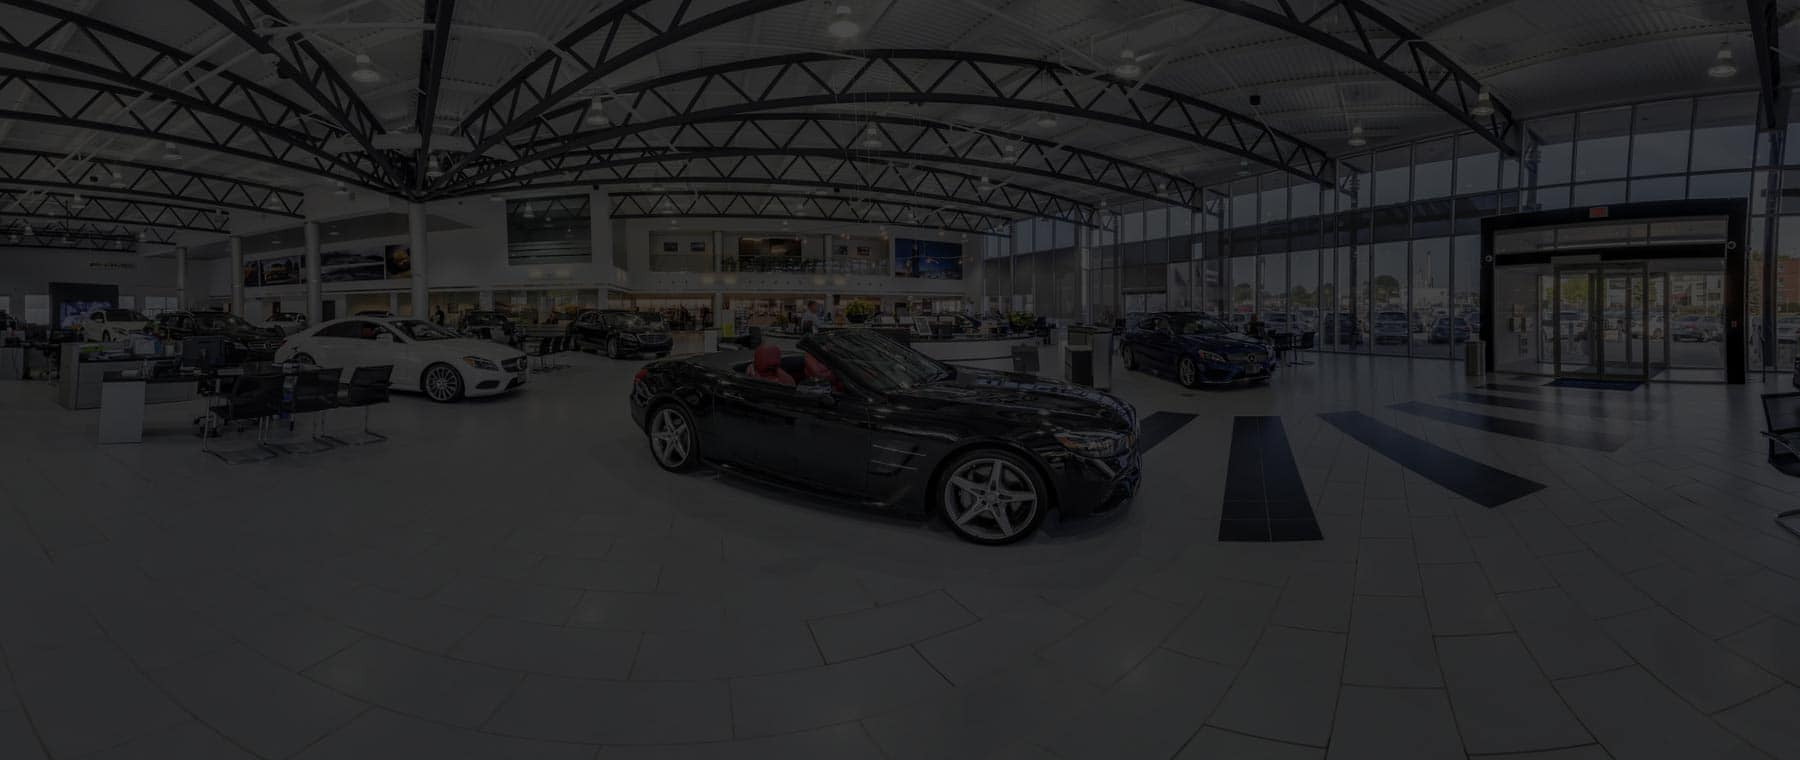 Mercedes benz midtown toronto mercedes benz dealership for Mercedes benz winter event commercial